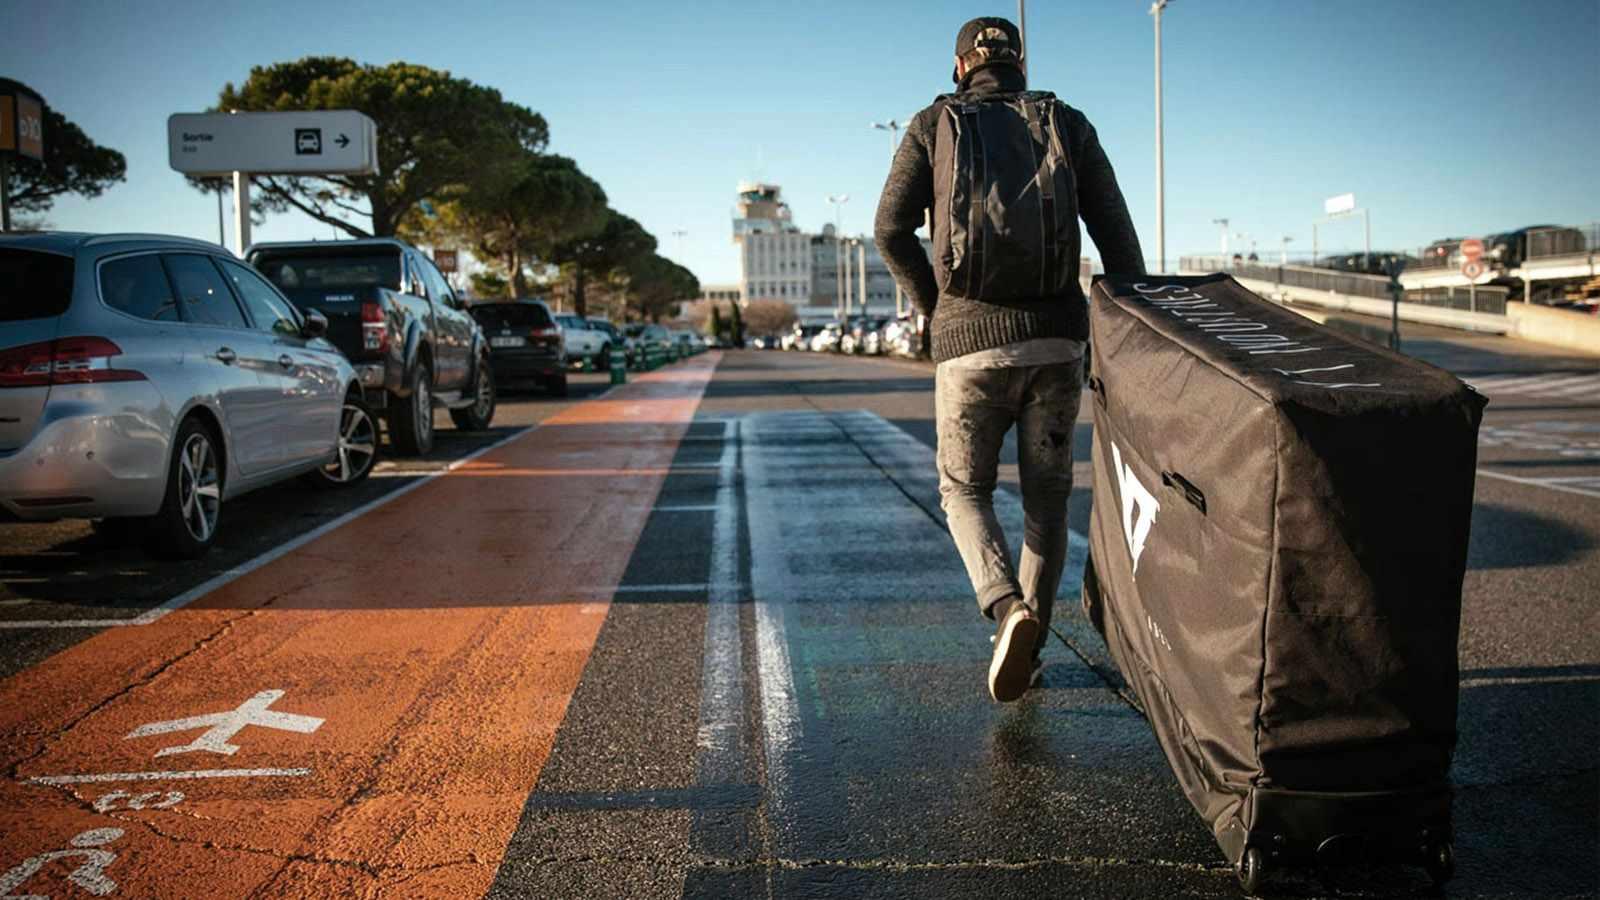 Man running along path at airport pulling the YT Body Bag